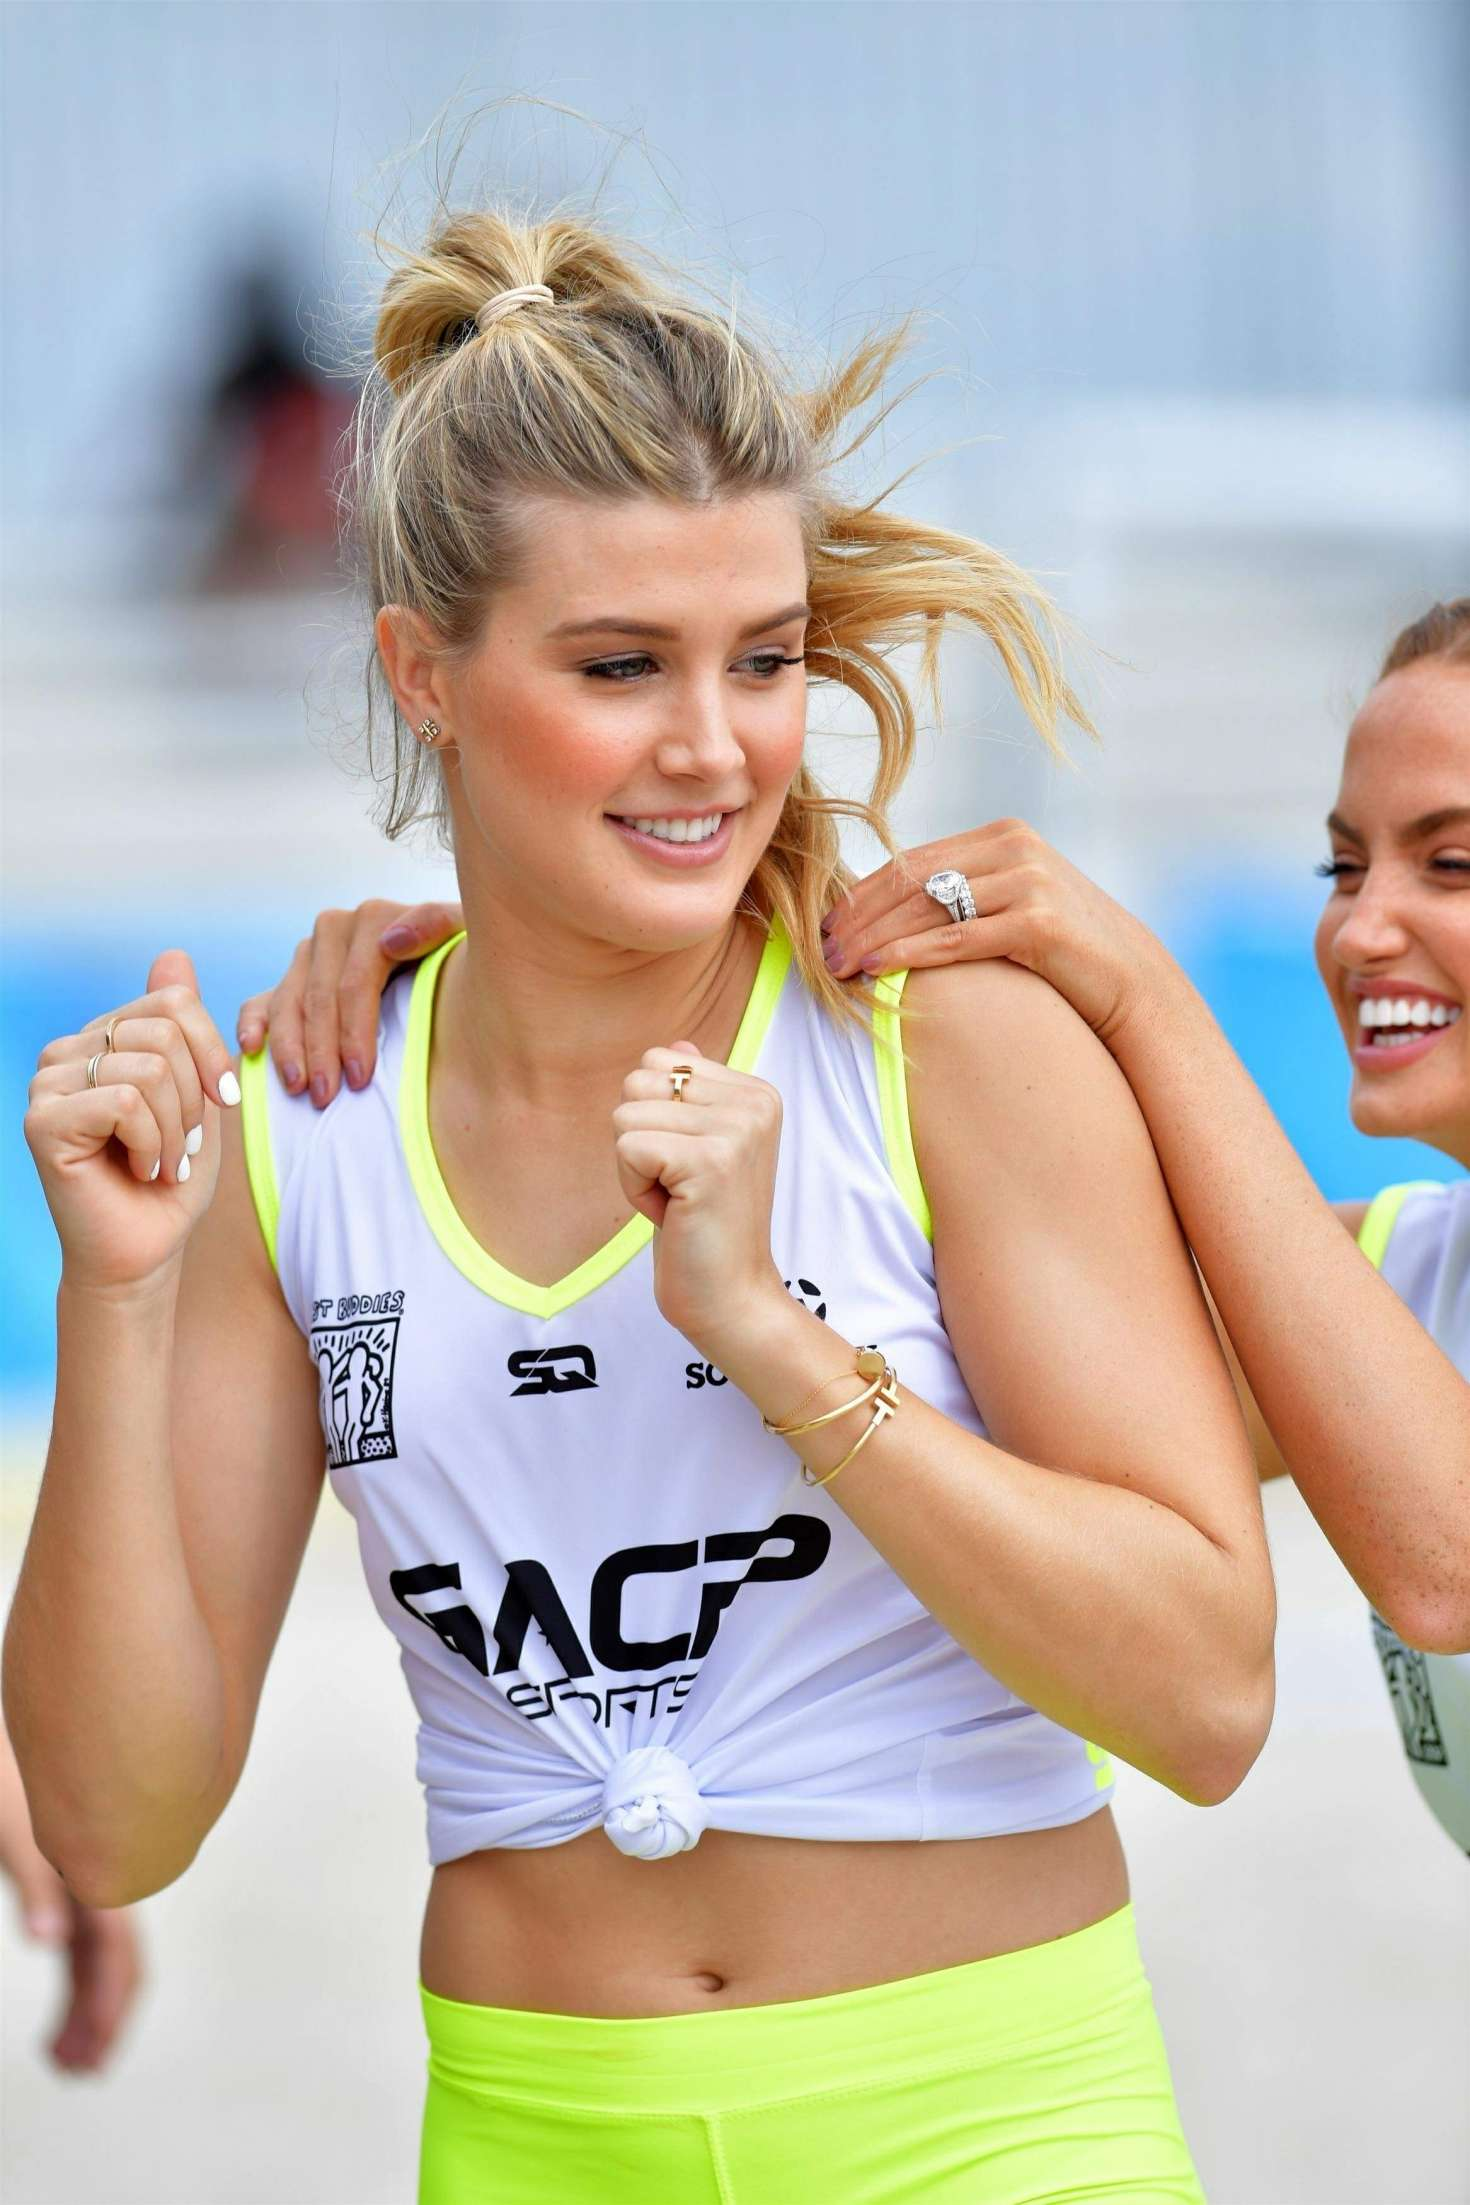 vizle100: Maria Sharapova: World Best Beautiful Sport